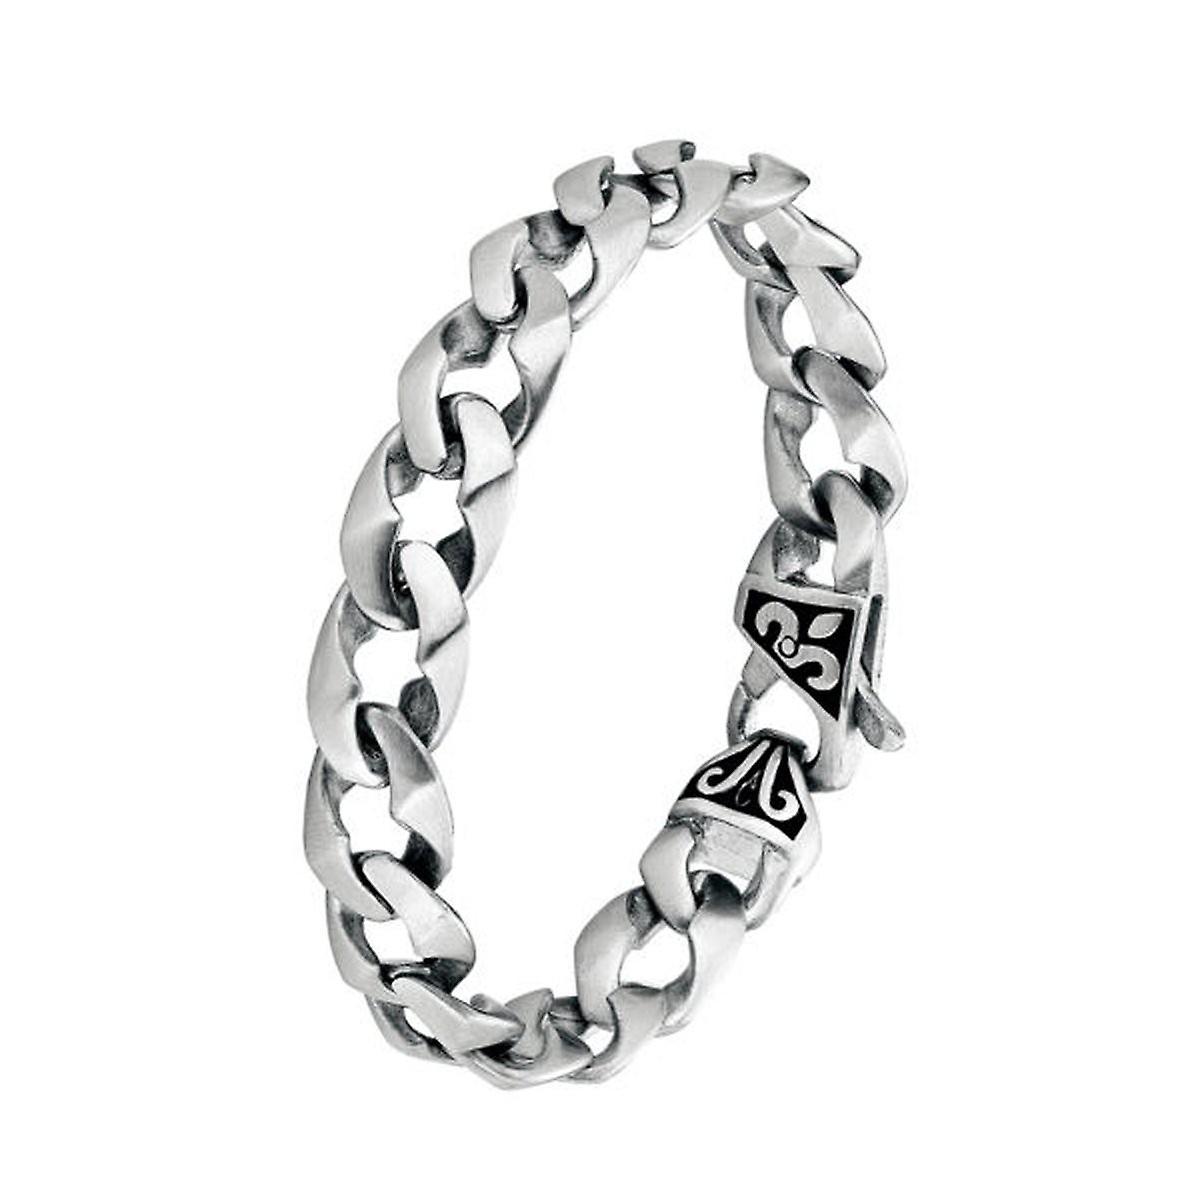 s.Oliver Jewel Men Bracelet Bangle stainless SO1028 / 1-465984